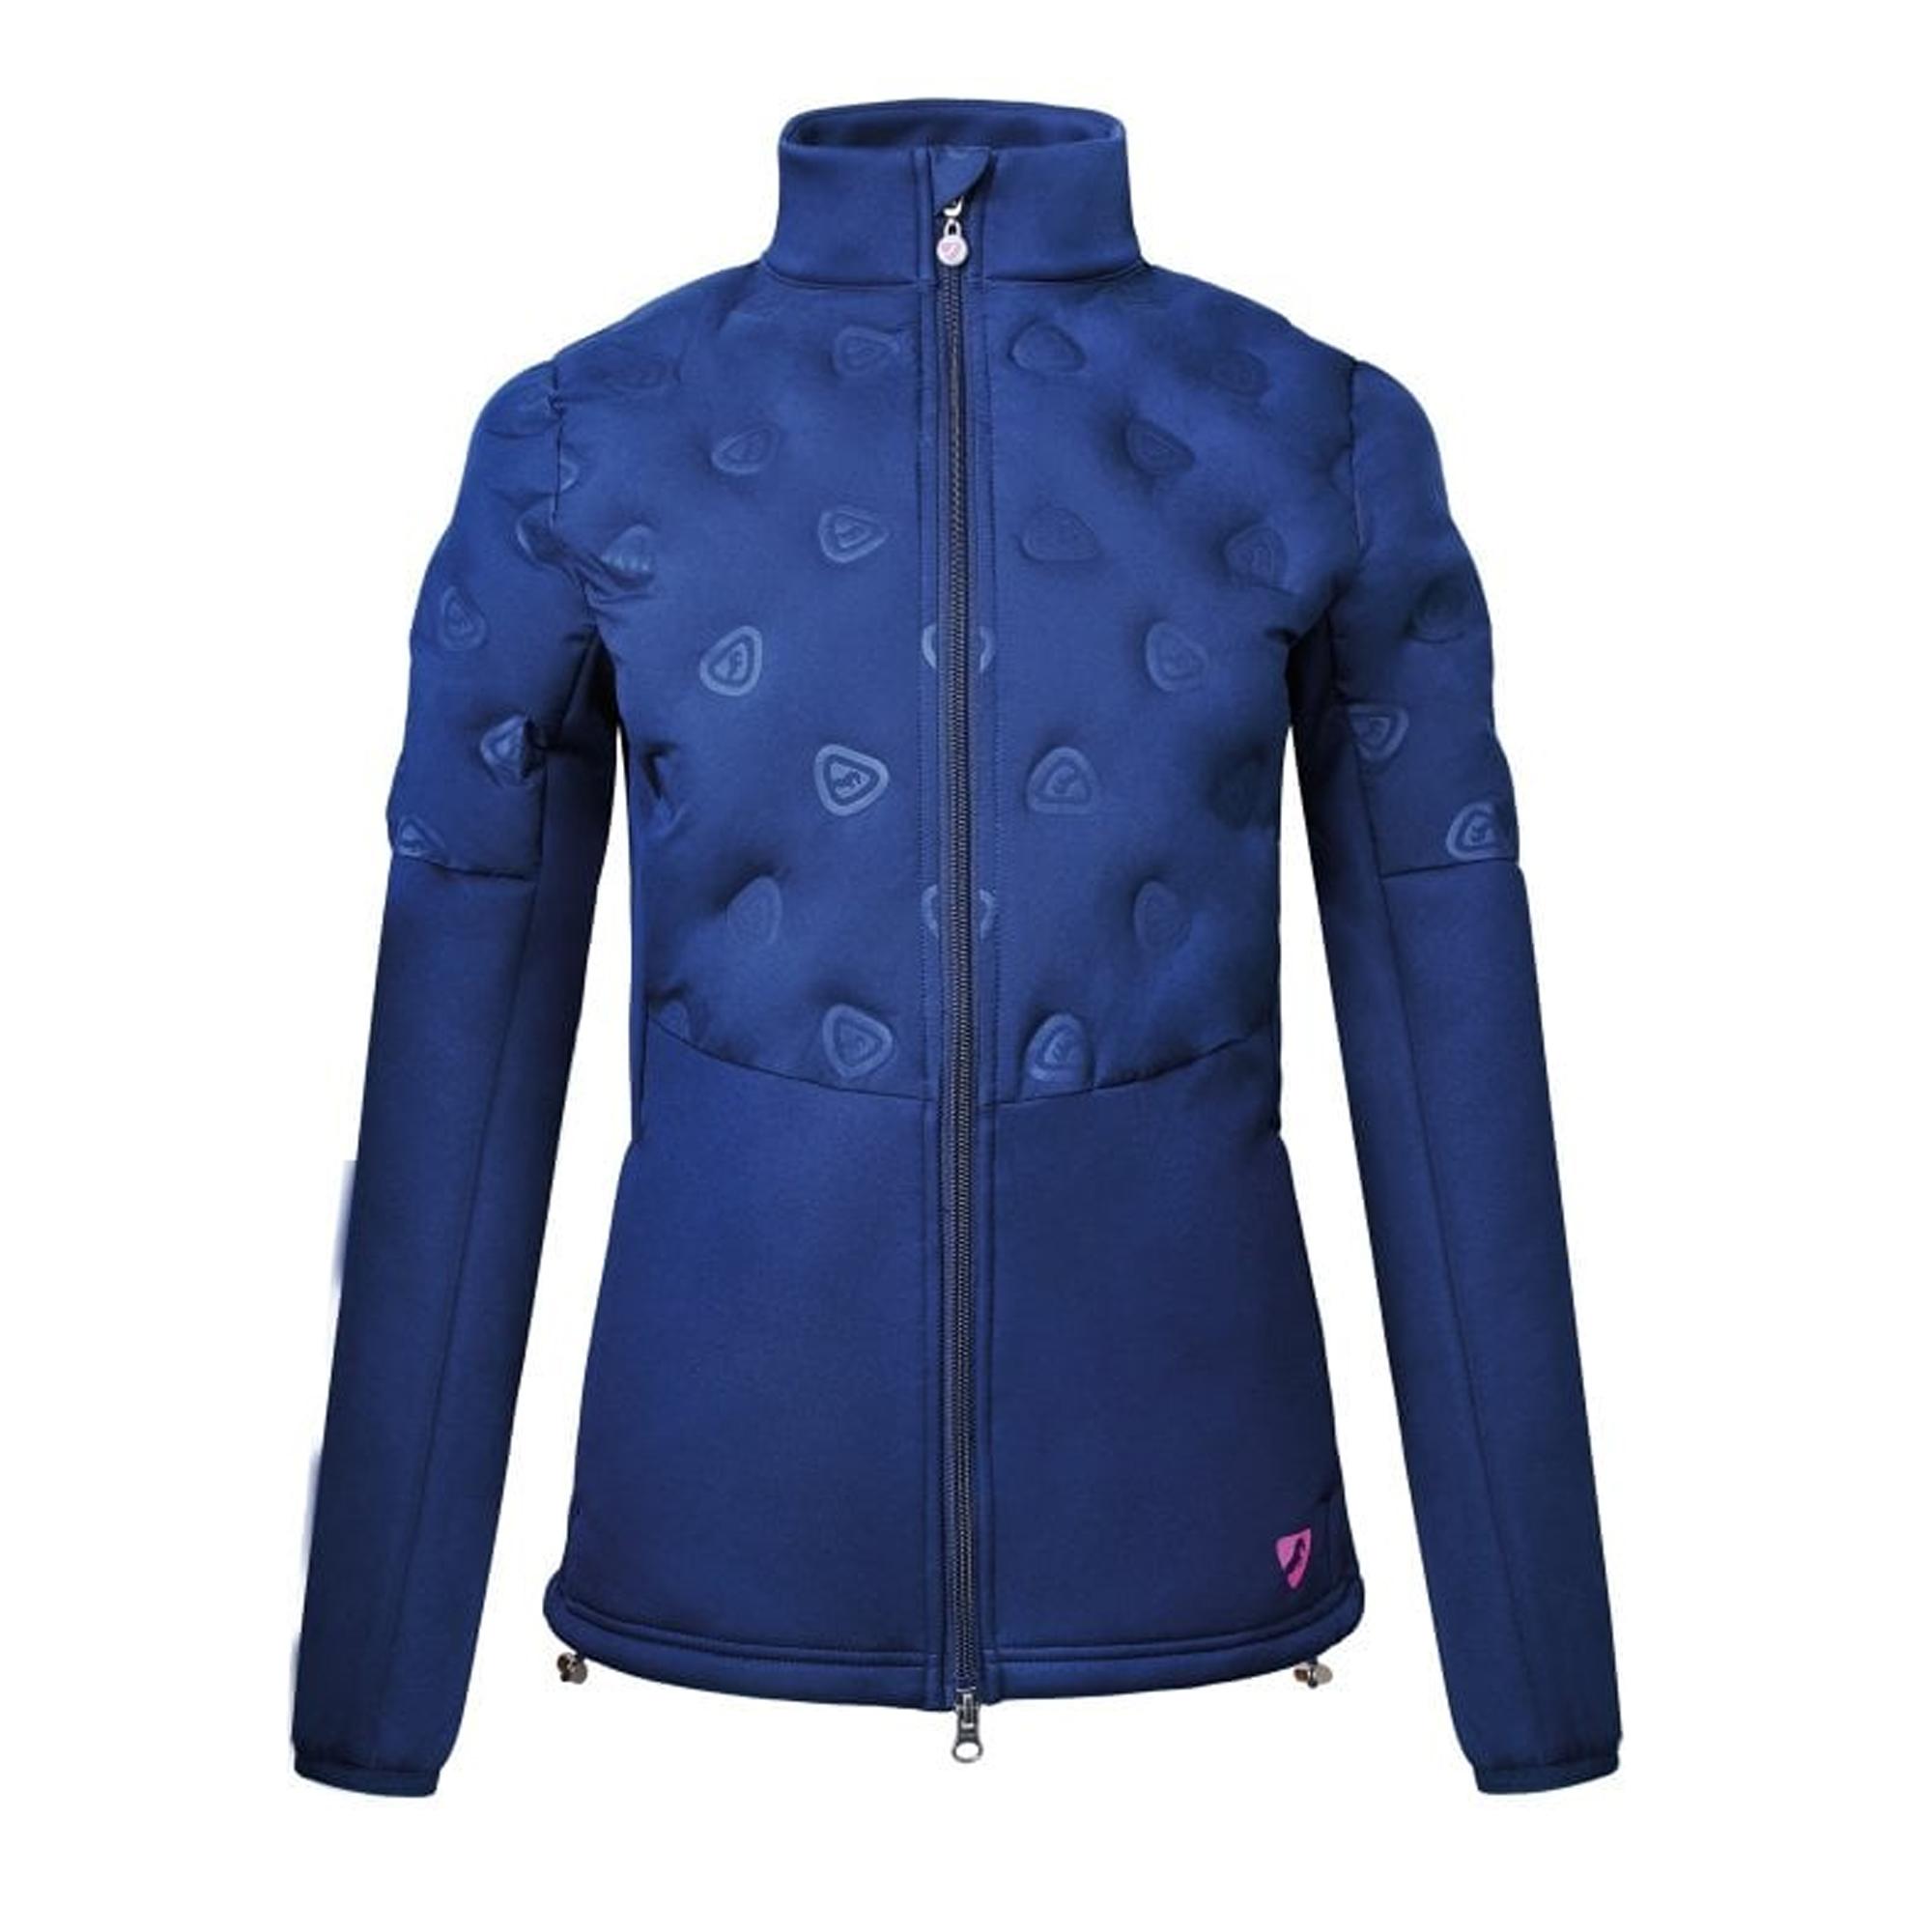 Aubrion Womens/Ladies Regent Horse Riding Jacket (XXL) (Navy)